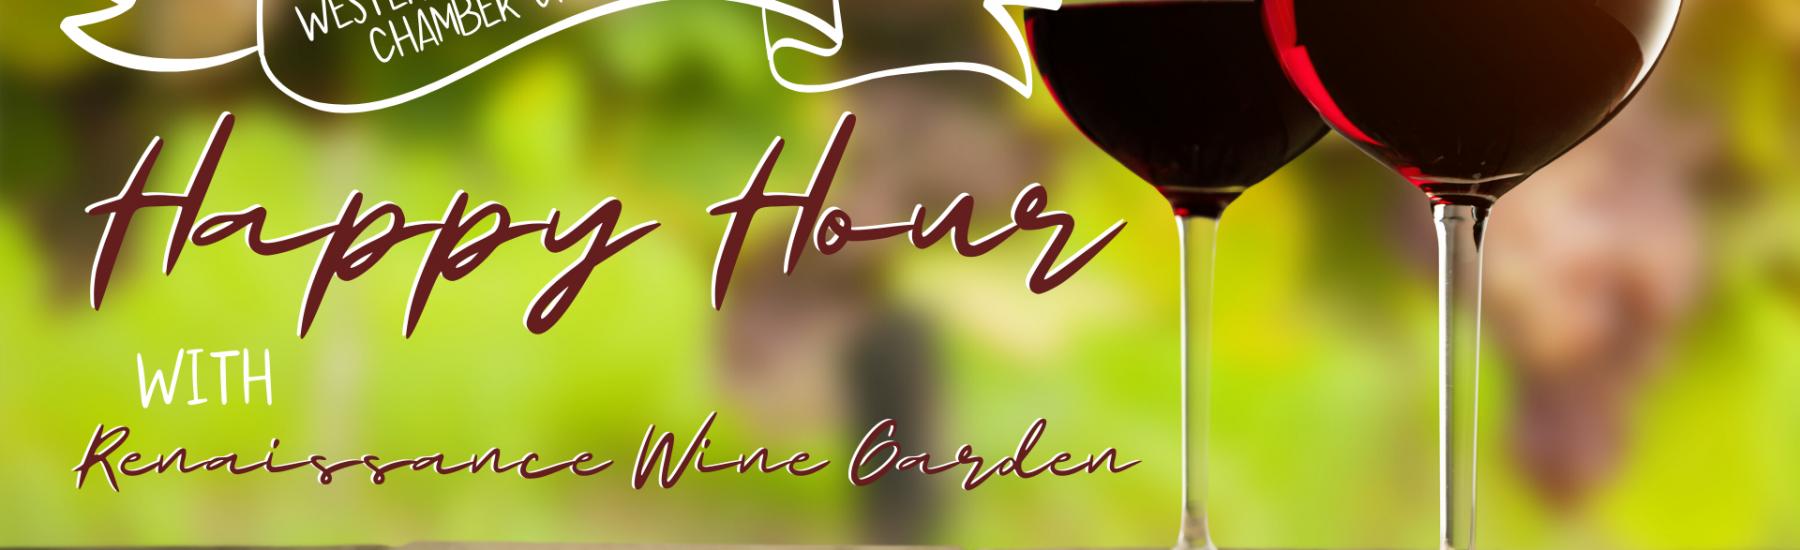 June Happy Hour at Renaissance Wine Garden